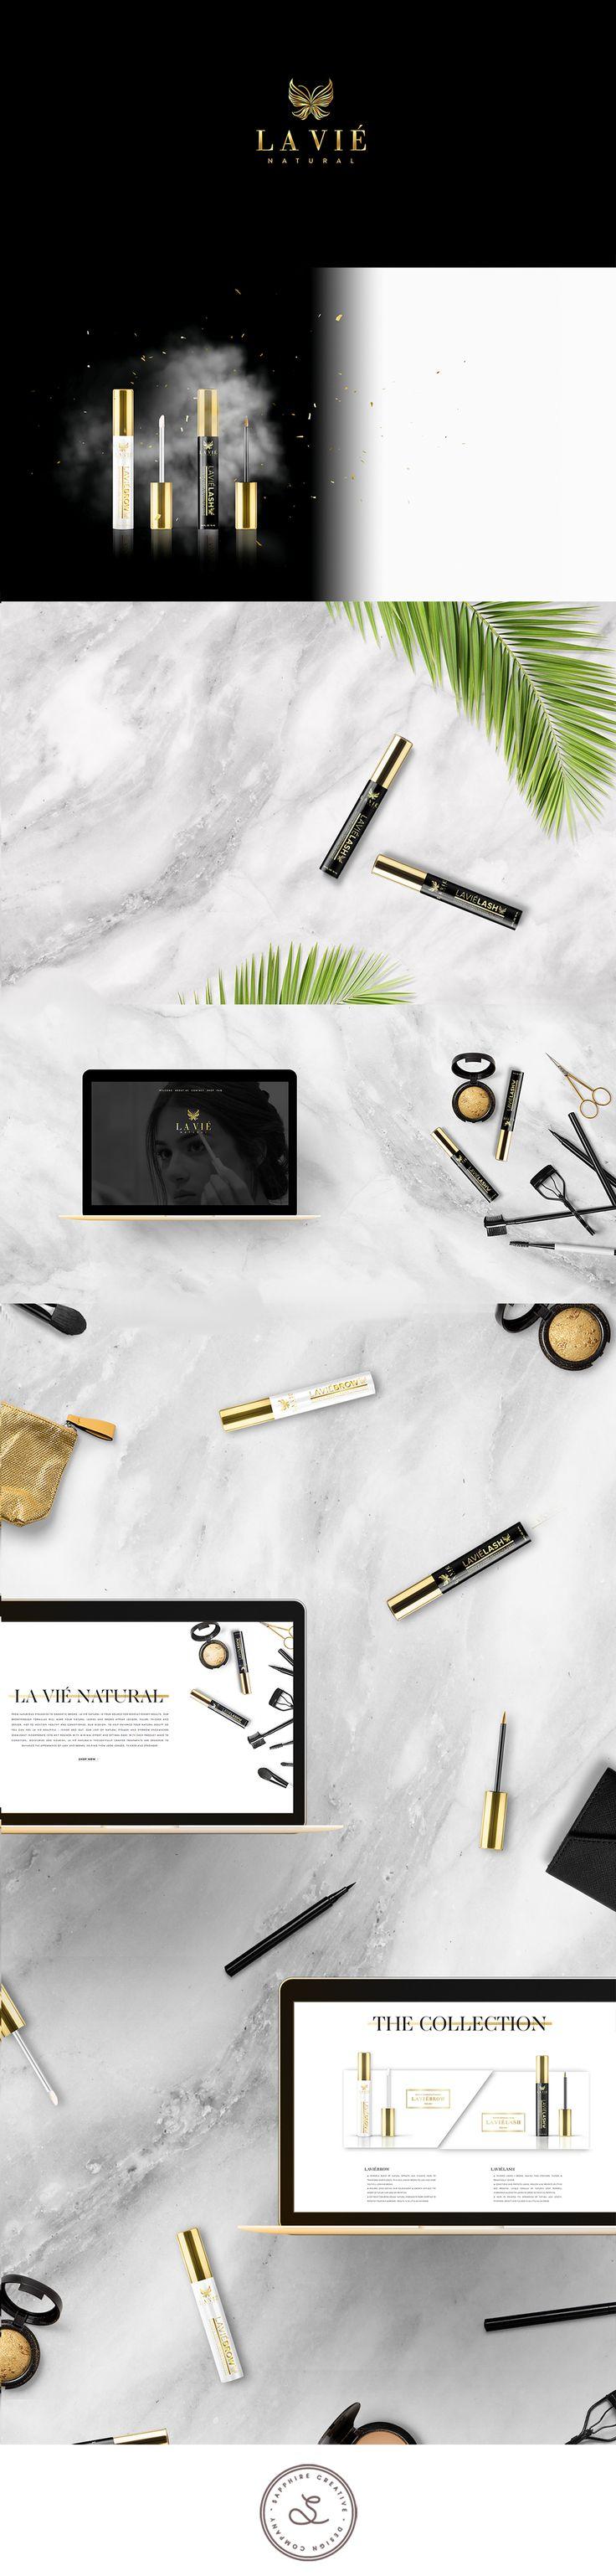 La Viè Natural Luxury Brand & Packaging Design by Yael Safirstein of Sapphire Creative Designs